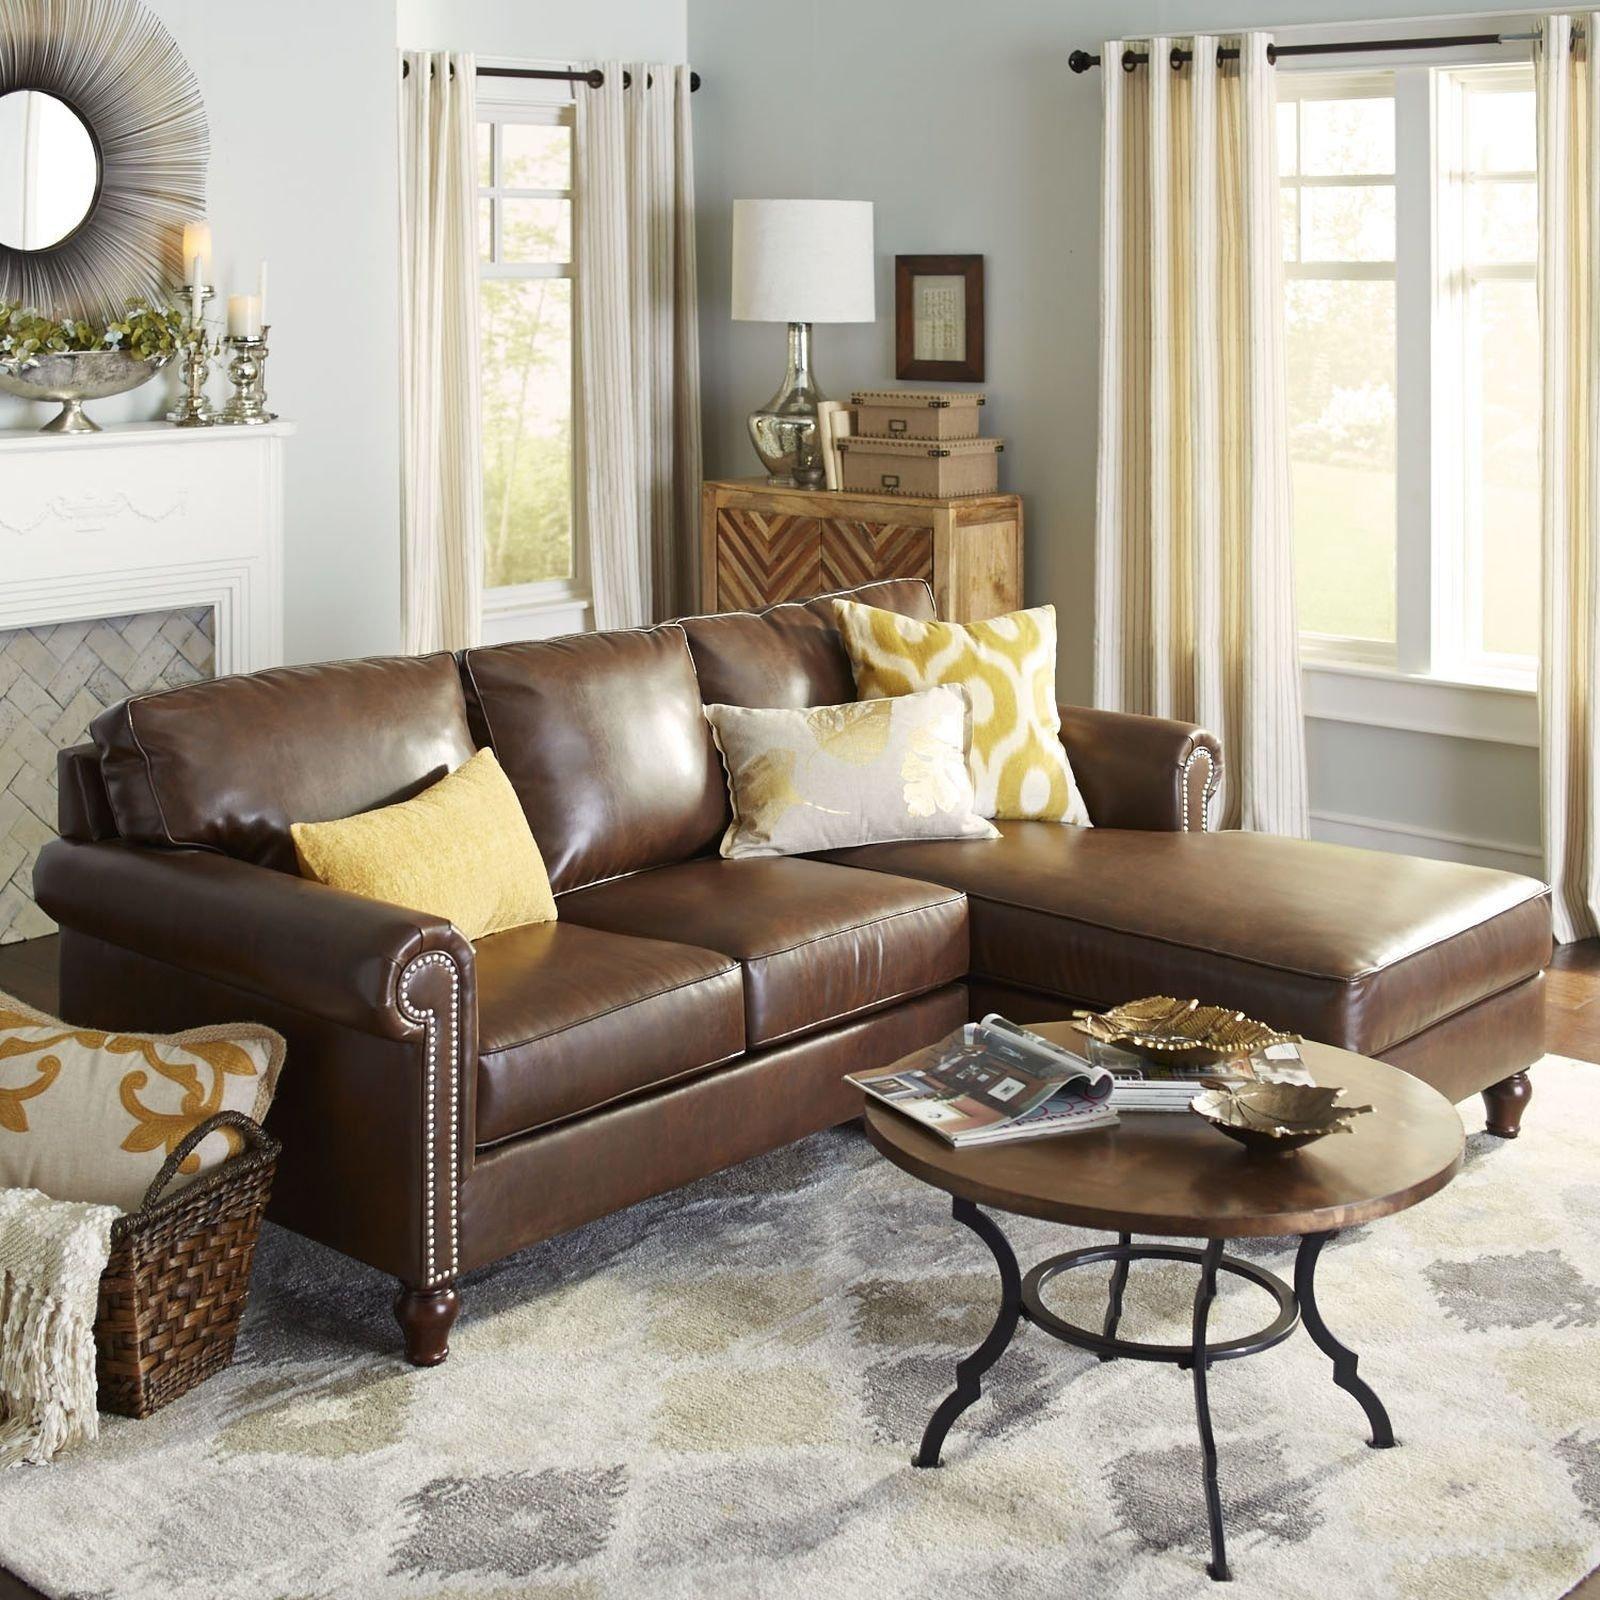 10 Great Pier One Living Room Ideas full hd pier one living room ideas of furniture mobile phones high 2020